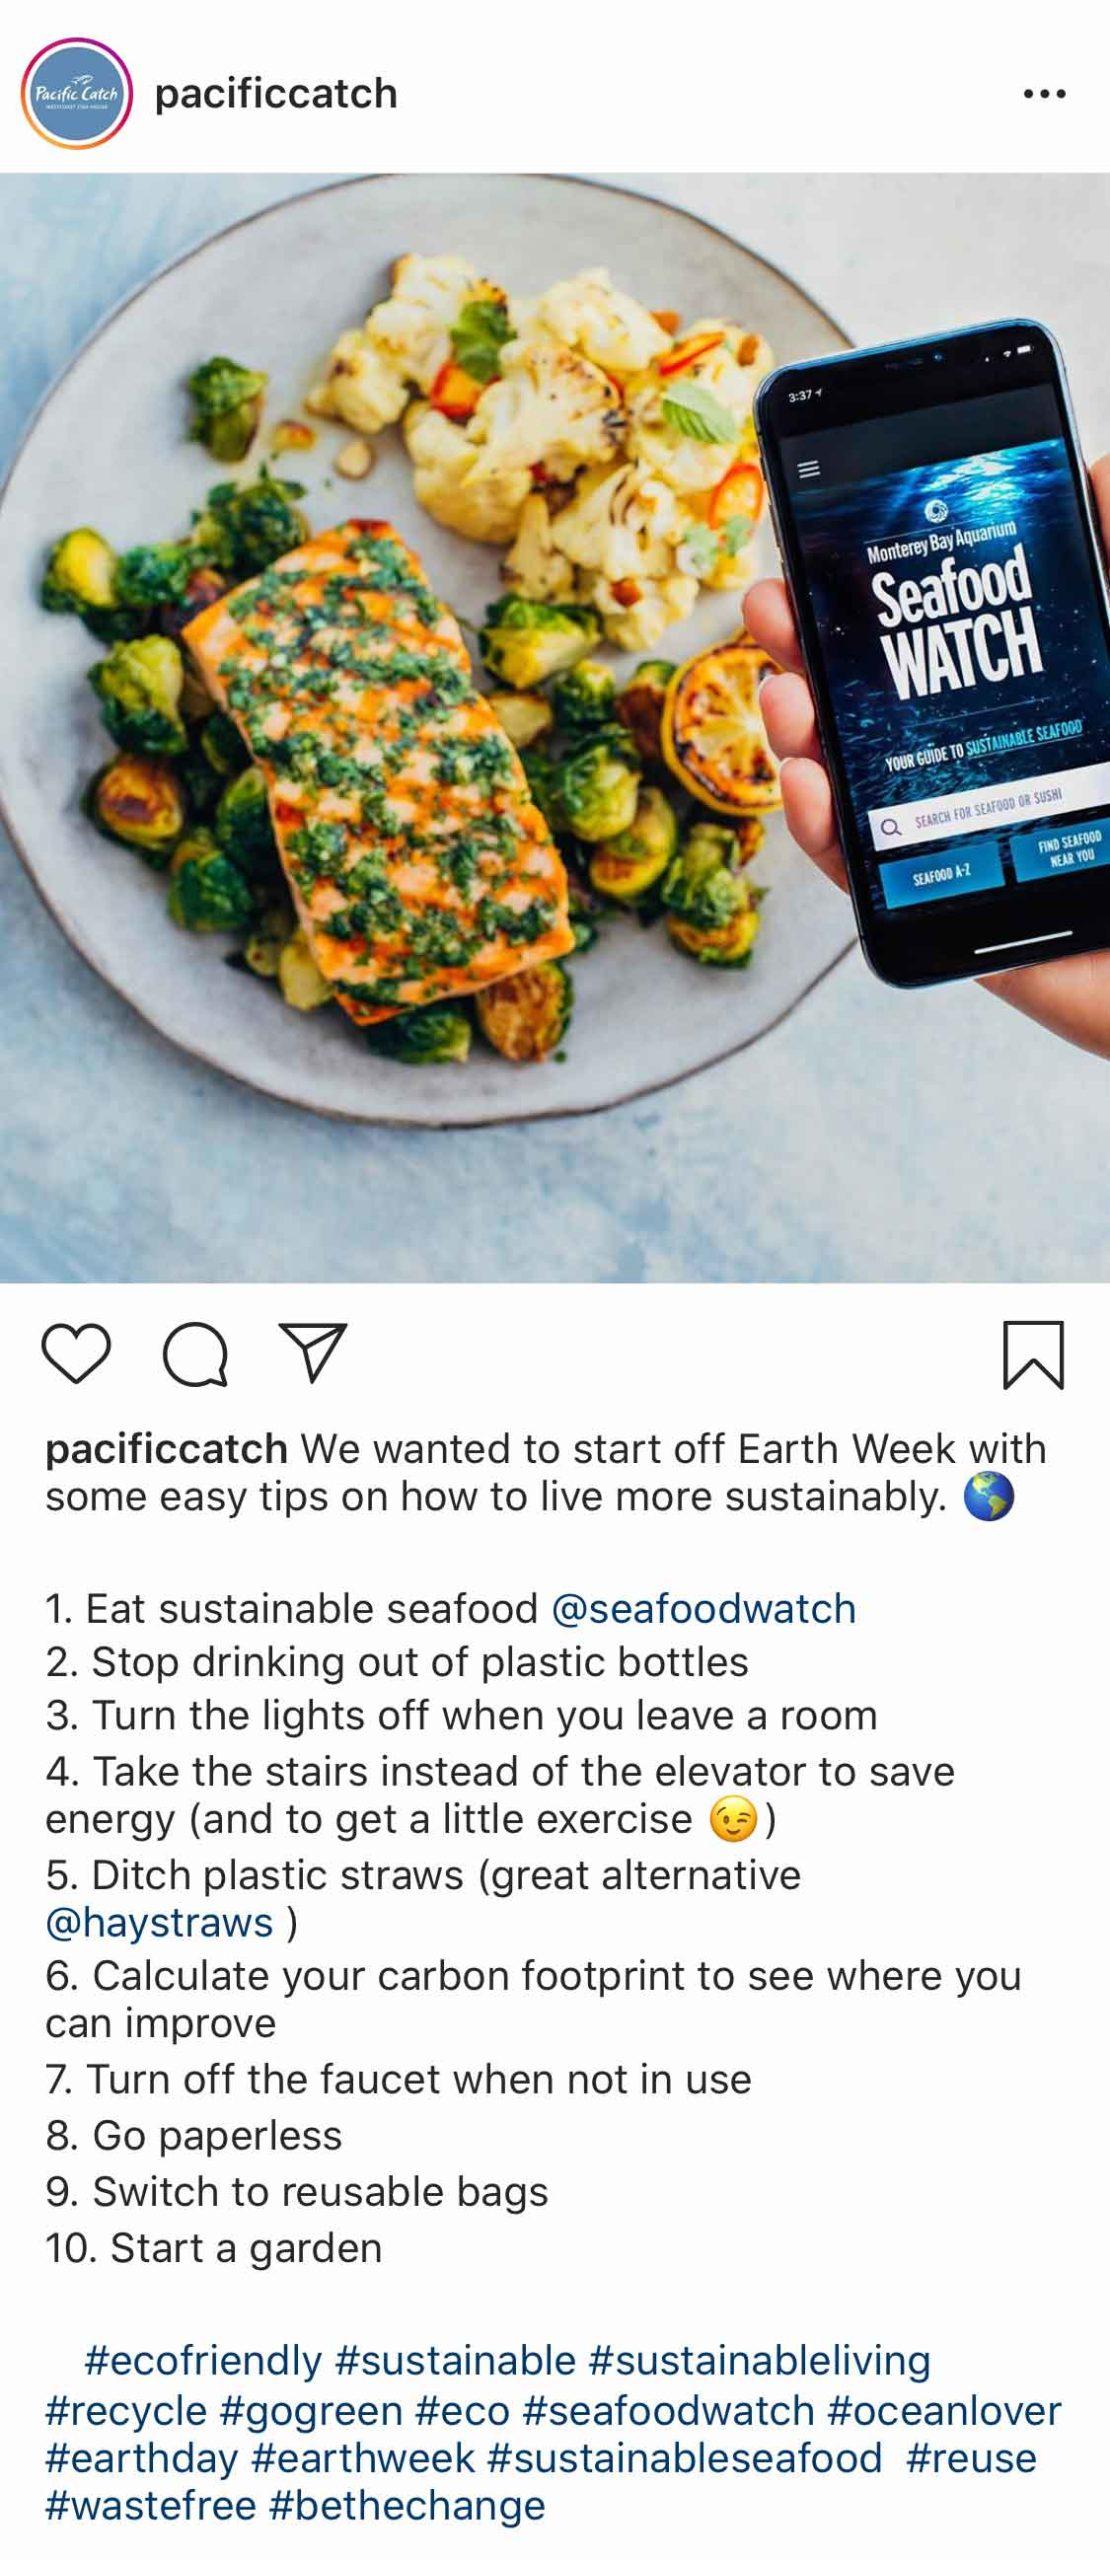 Pacific Catch: Earth Week Ideas